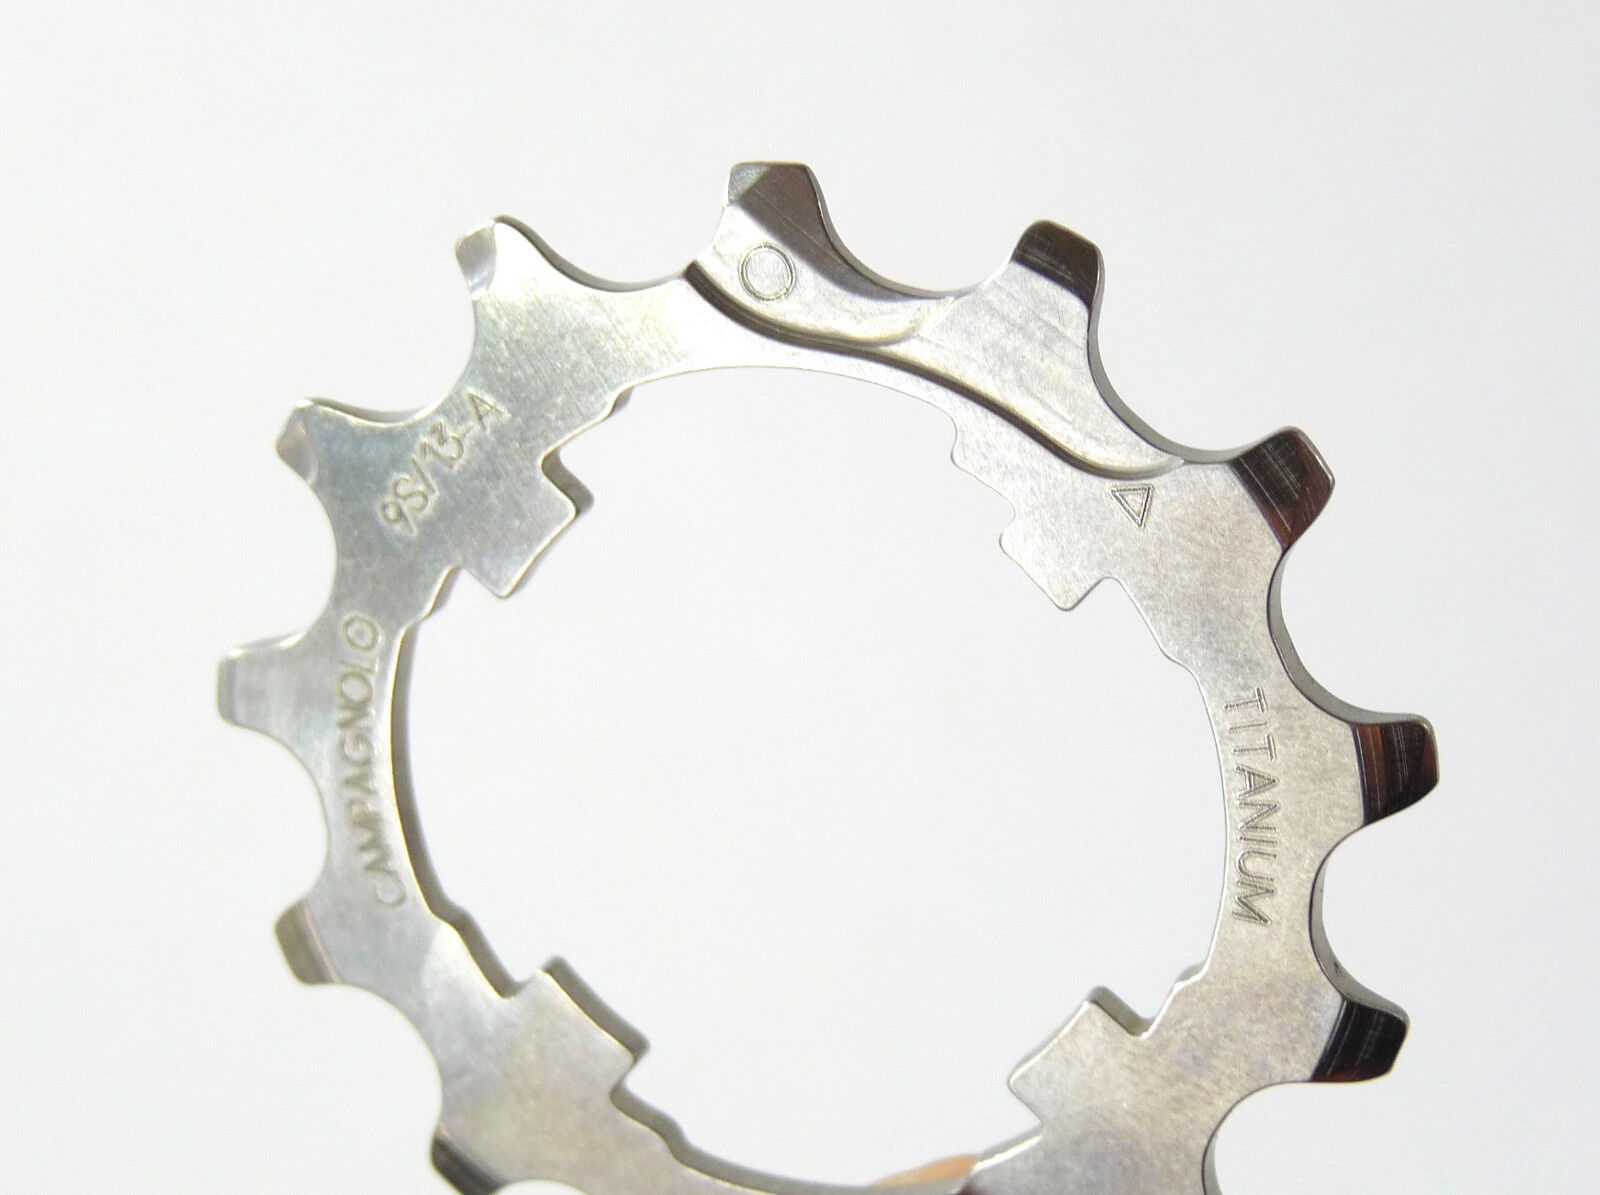 Campagnolo Record TITANIUM 9 speed Cassette Cog 13t EXA-Drive Vintage Bike NOS